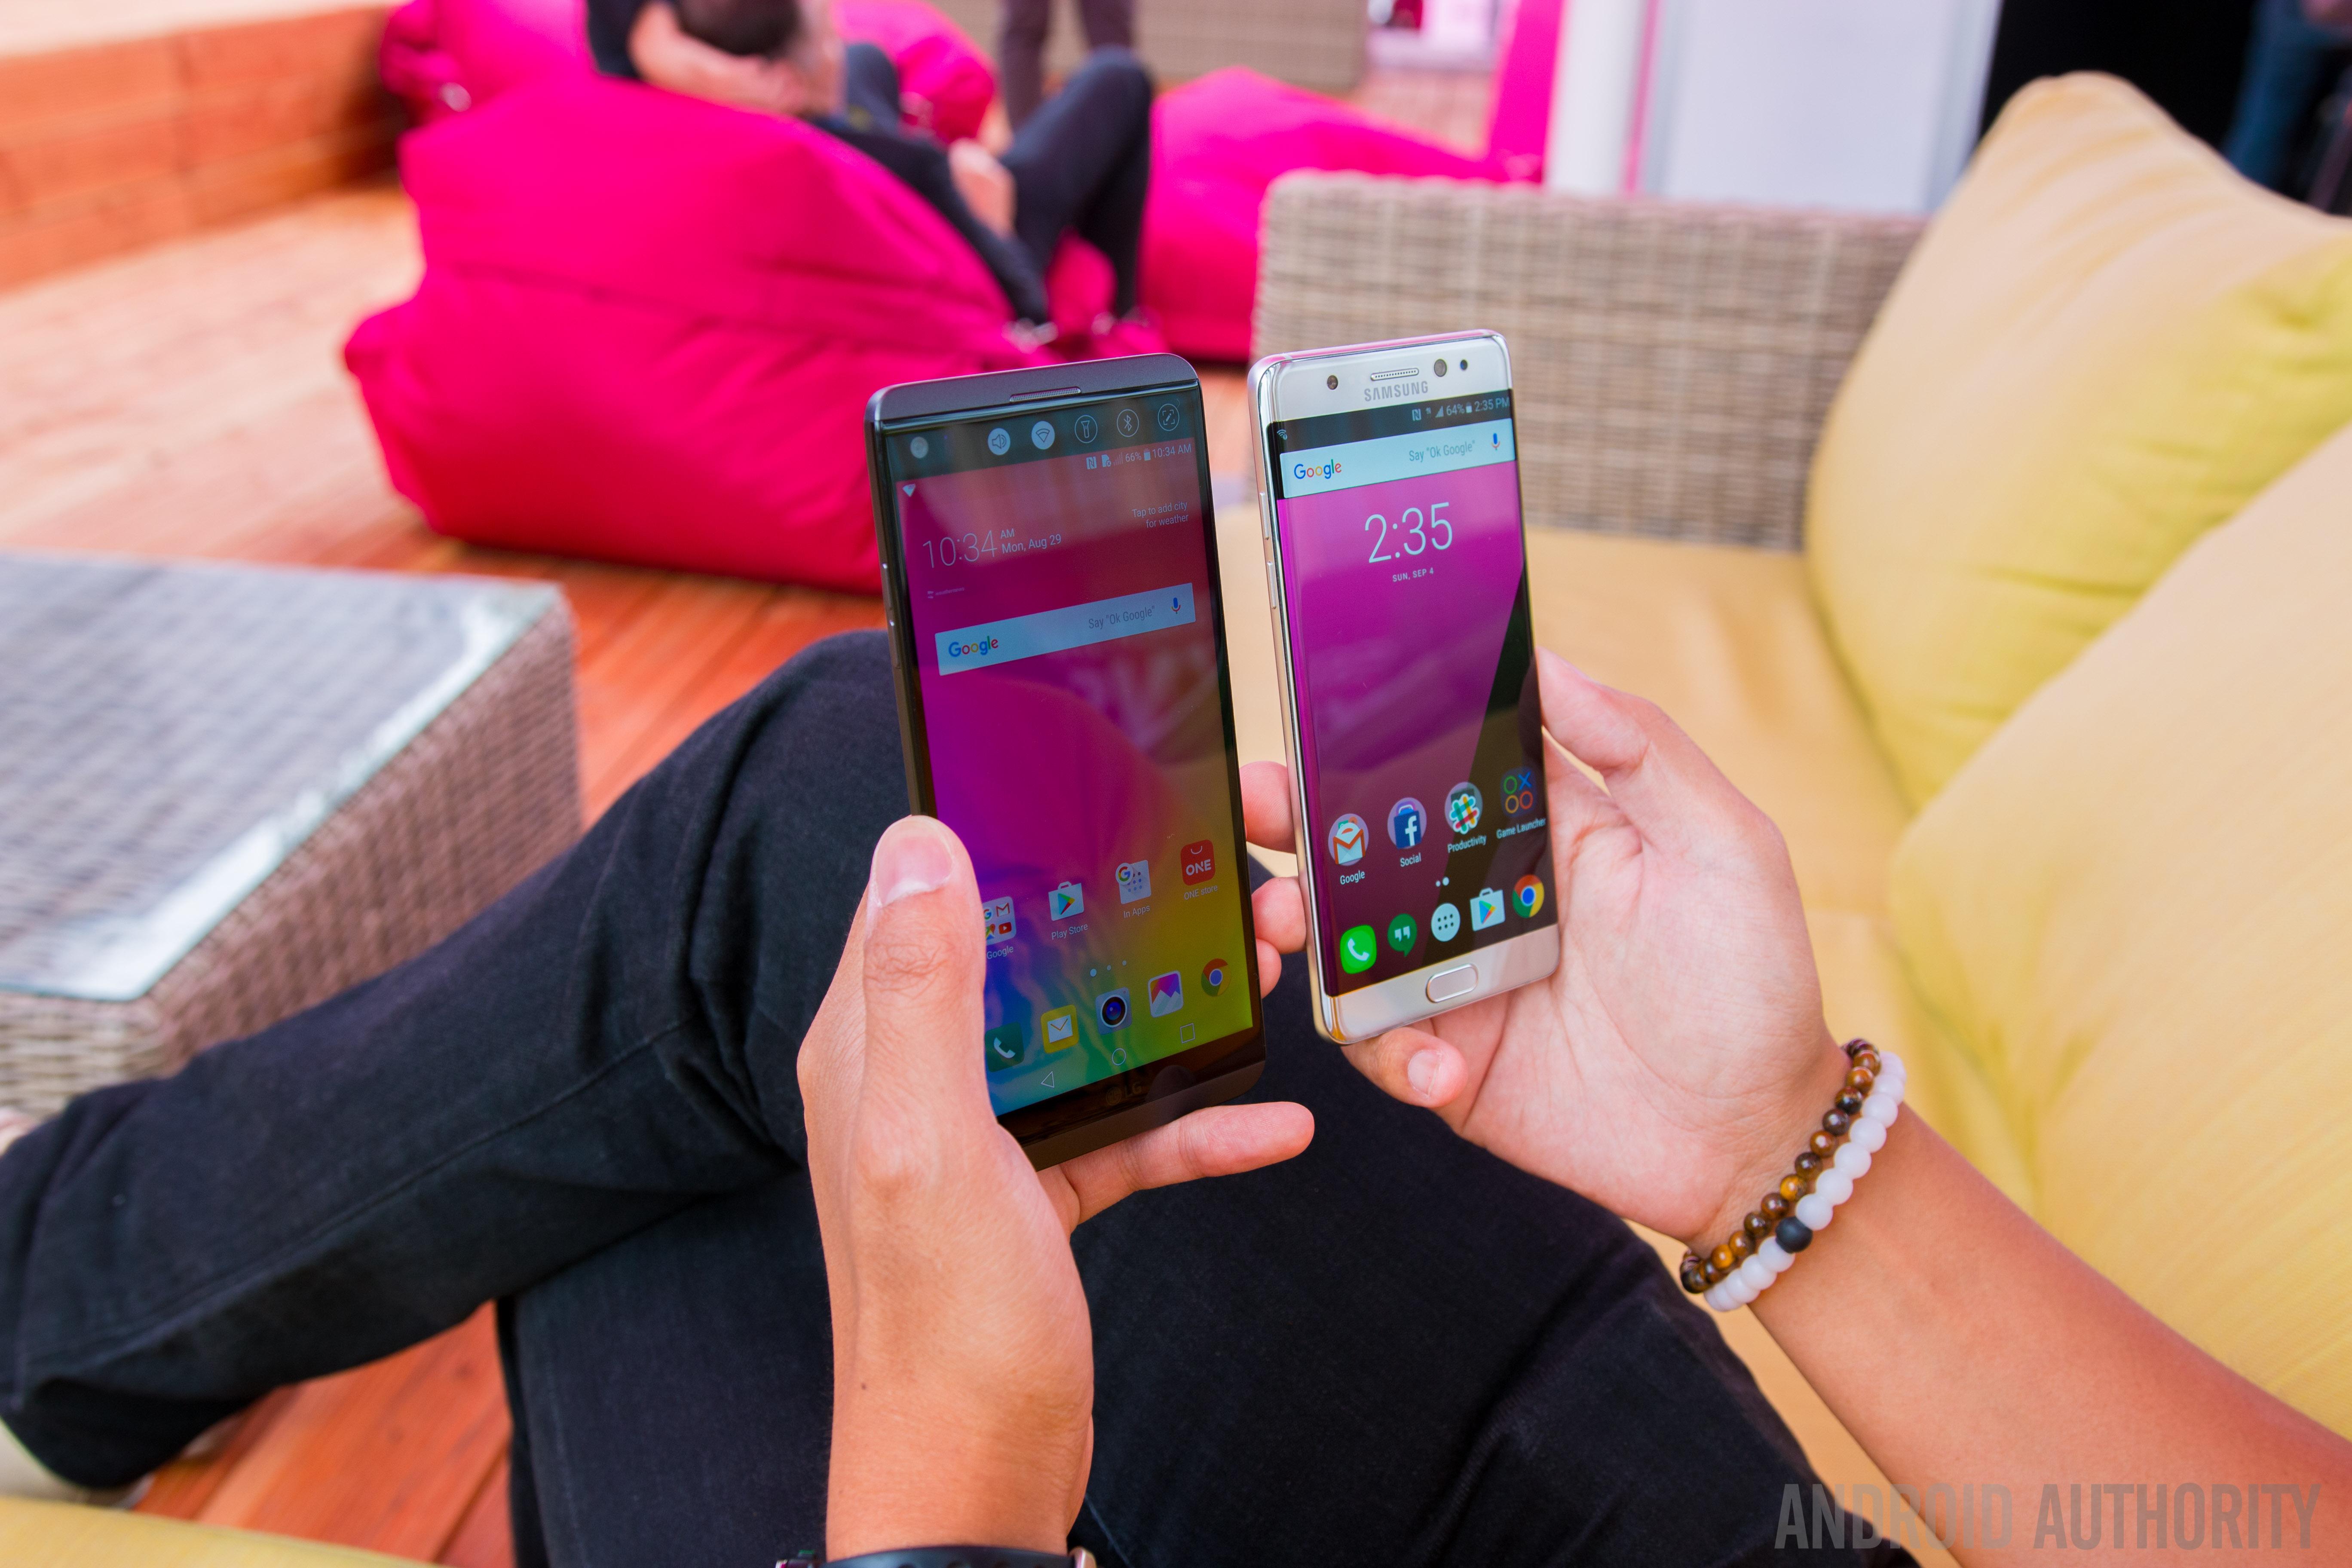 LG V20 vs Samsung Galaxy Note7 Quick Look-3